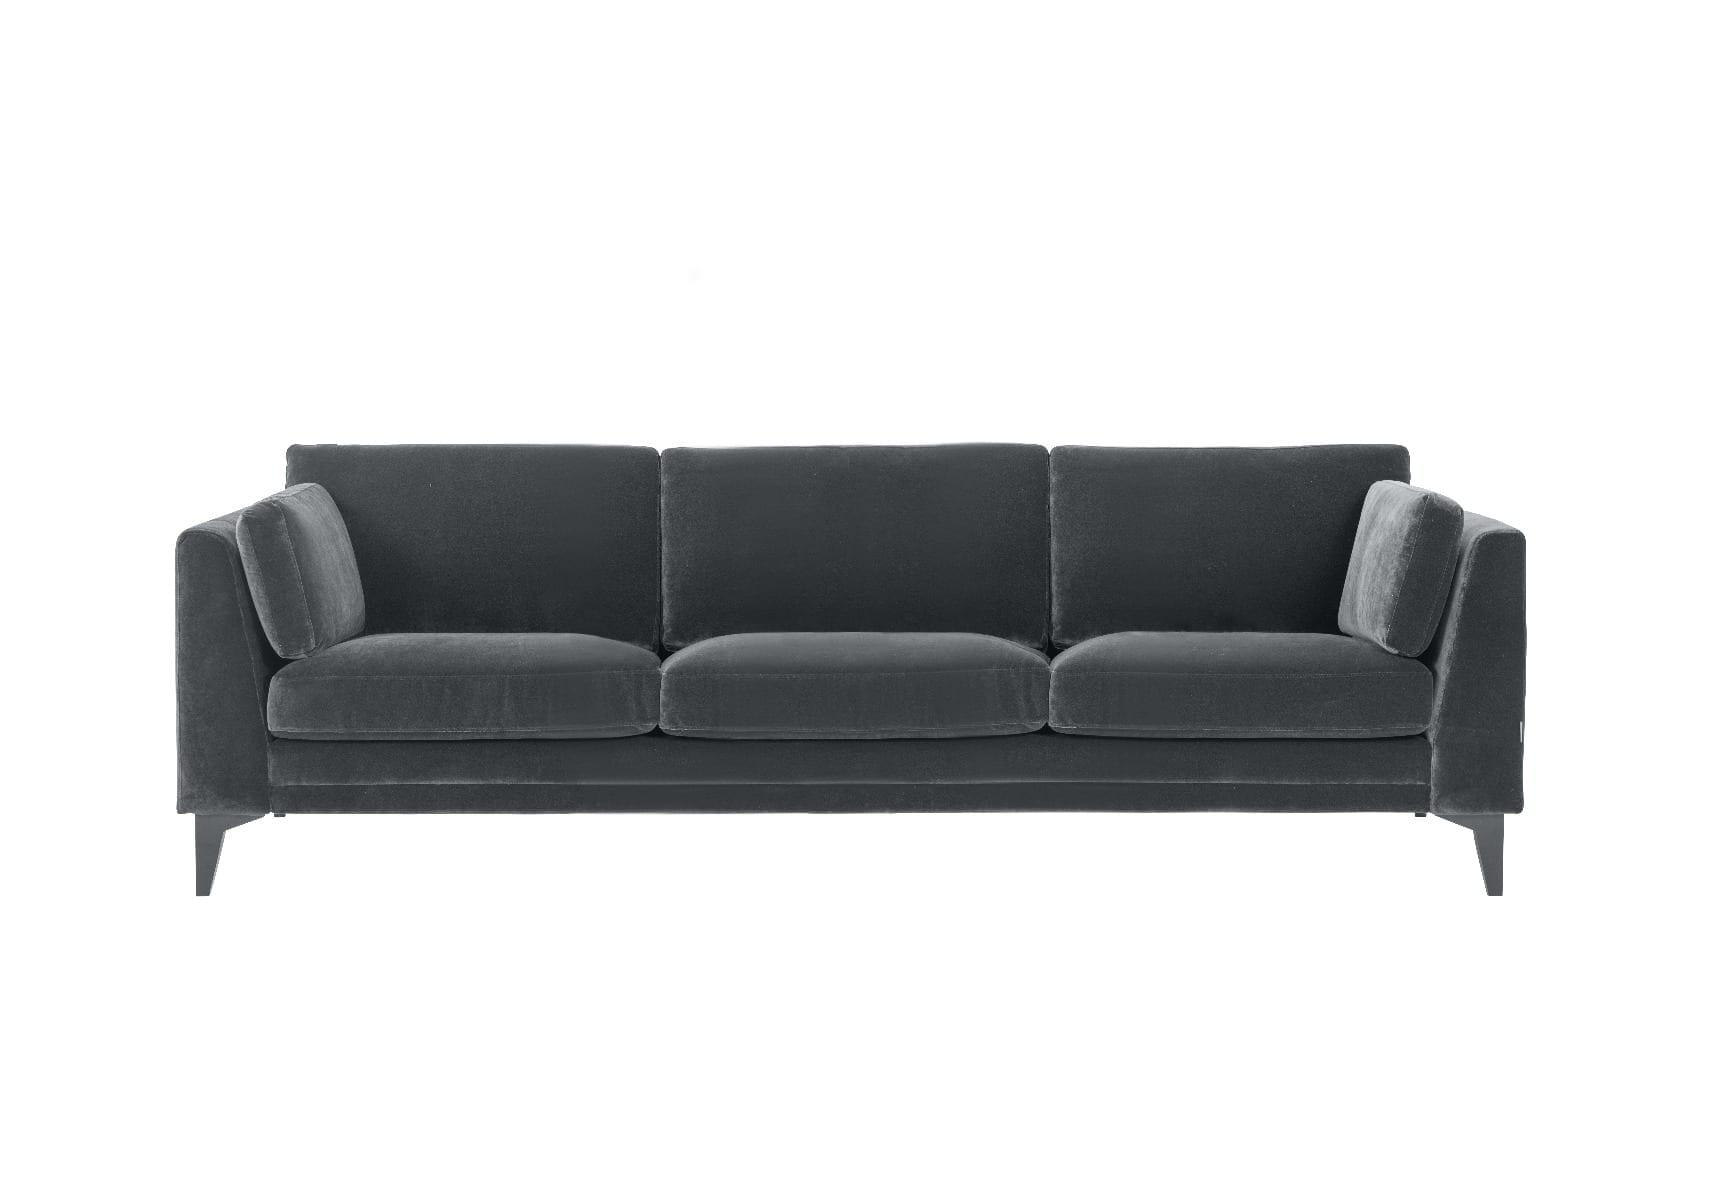 Fantastic Avignon 4 Seater Sofa Best Image Libraries Sapebelowcountryjoecom